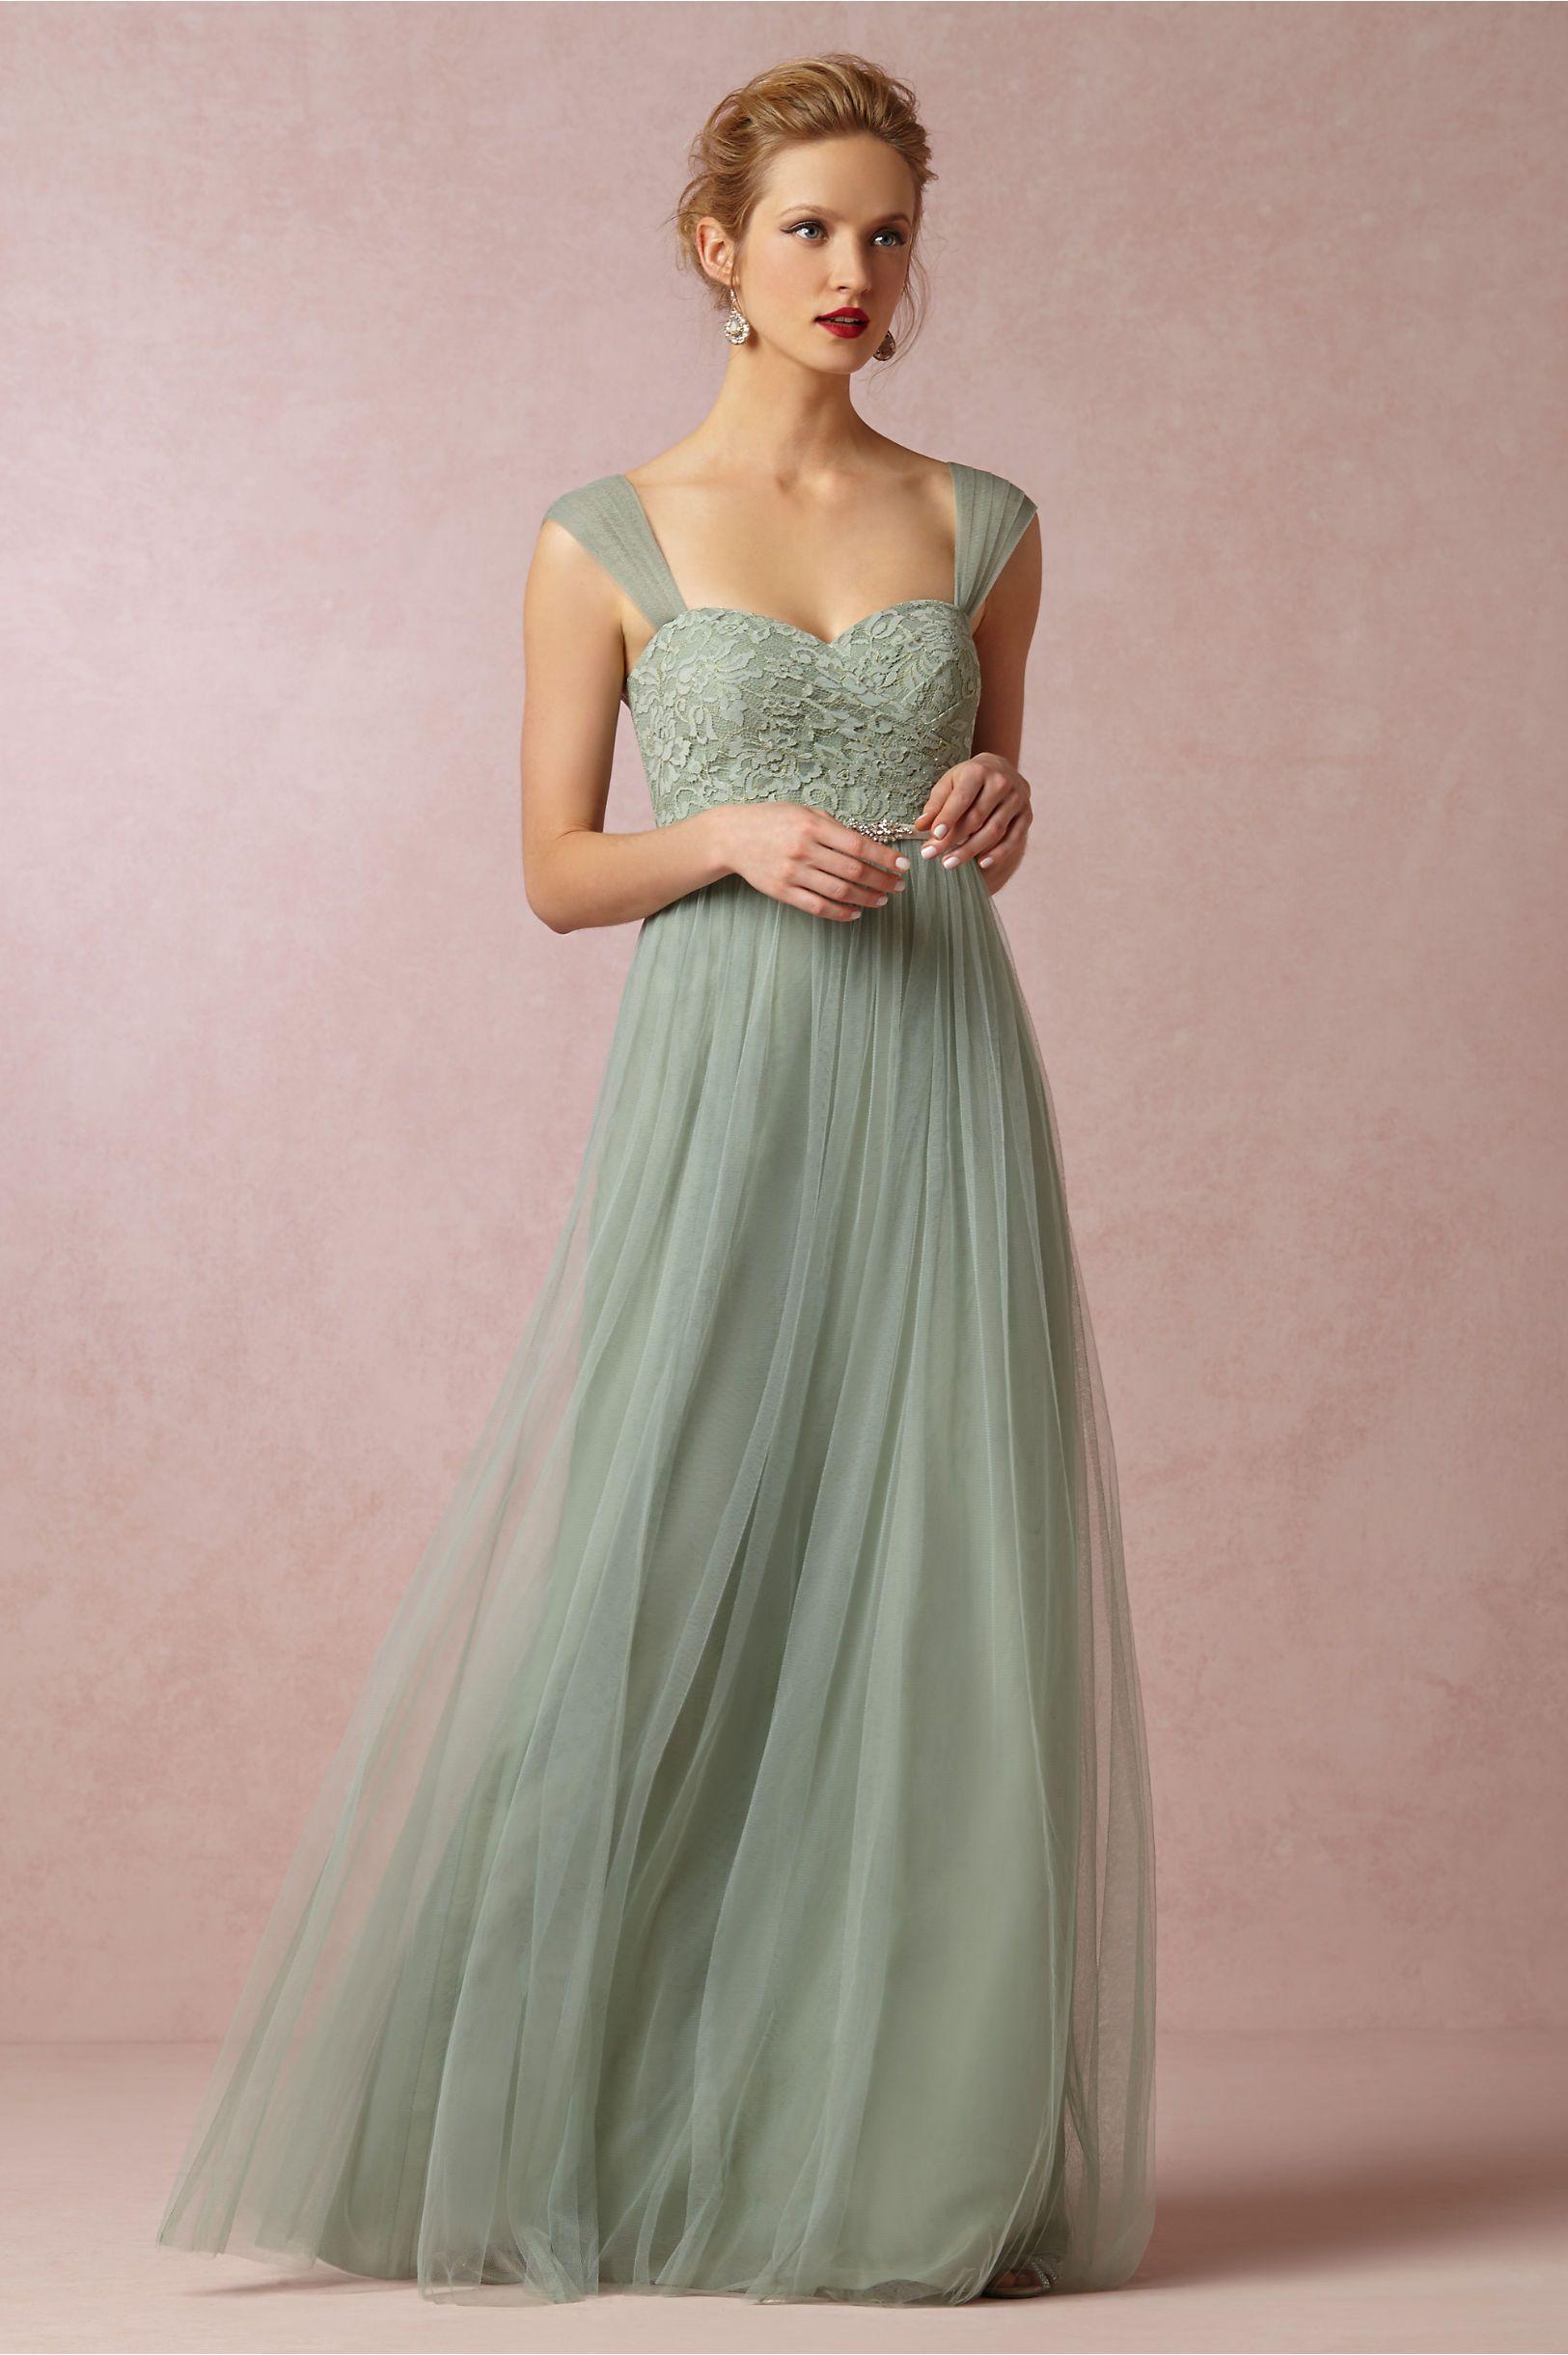 Juliette dress in bridesmaids bridesmaid dresses long at bhldn